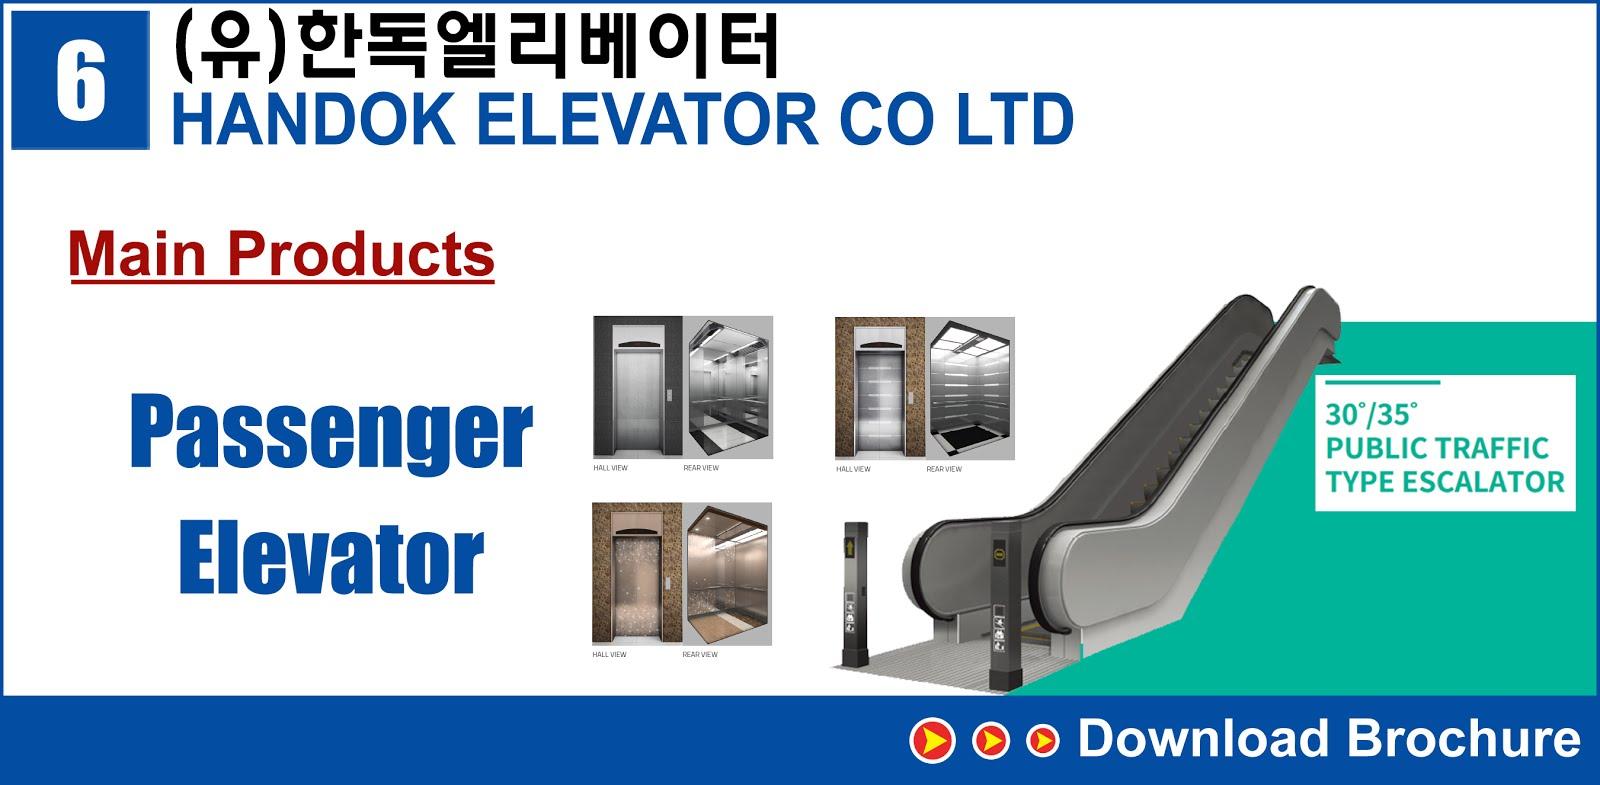 6.HANDOK ELEVATOR CO LTD